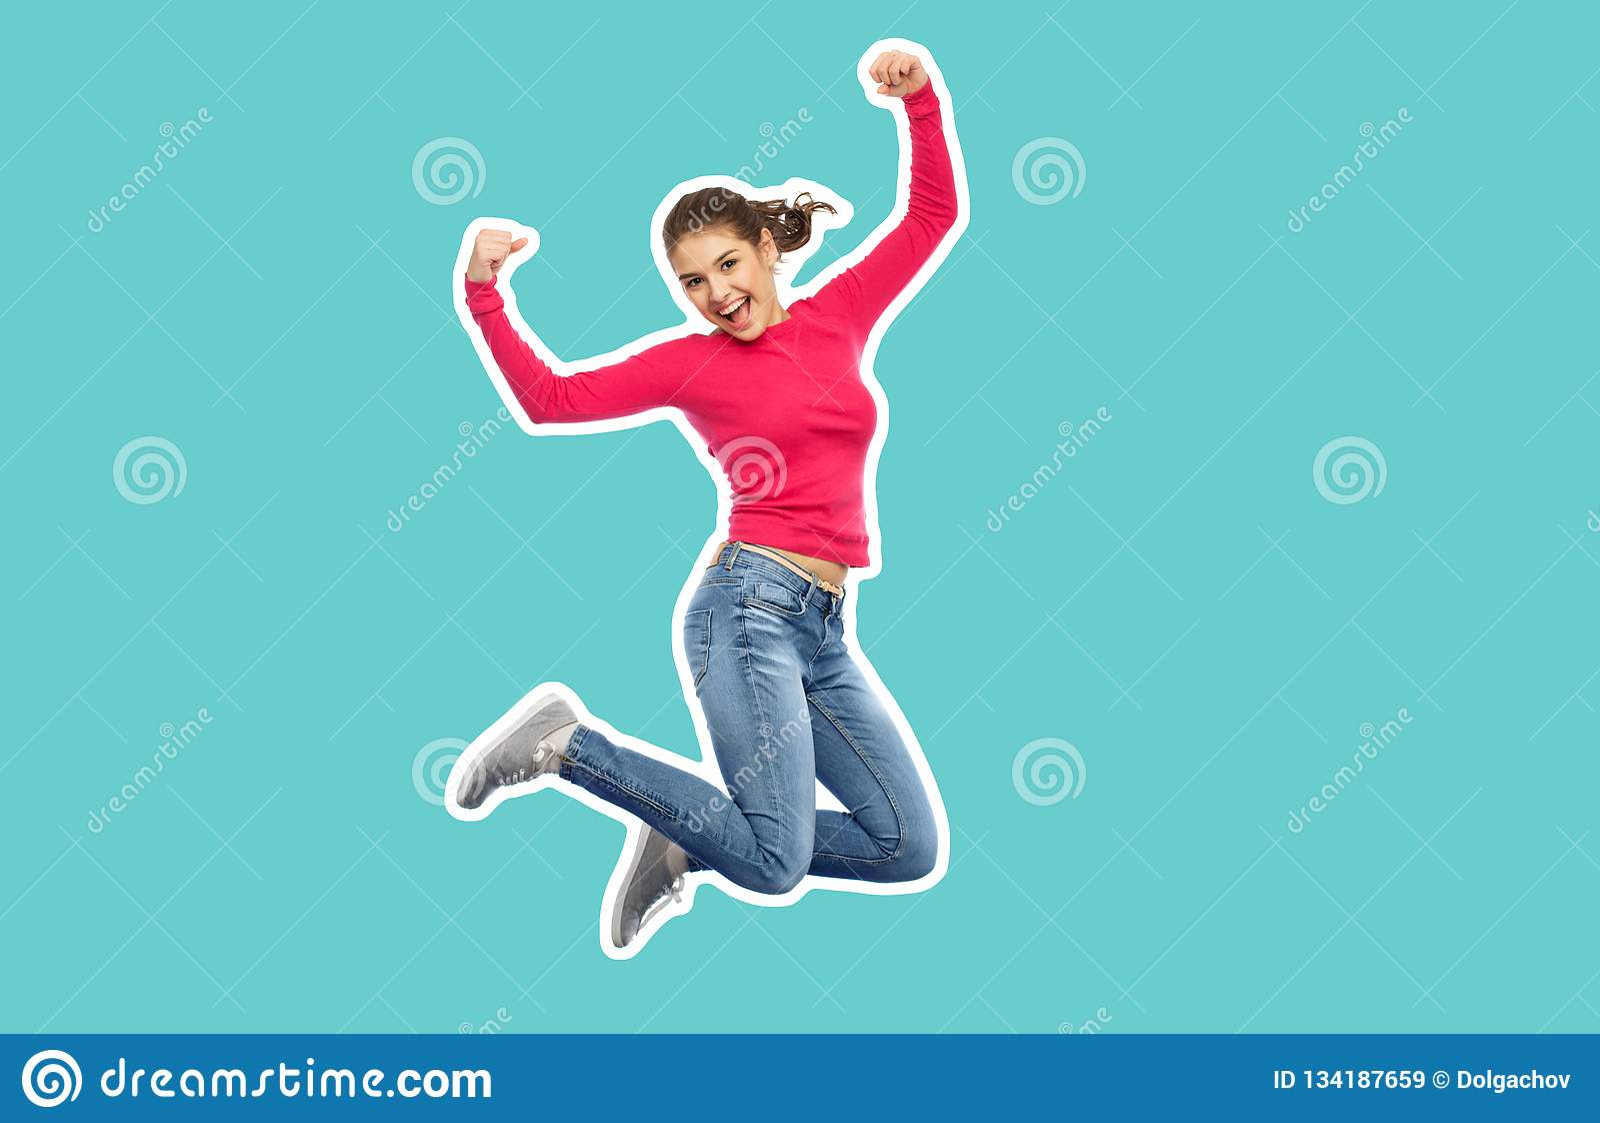 Smiling teenage girl jumping in air